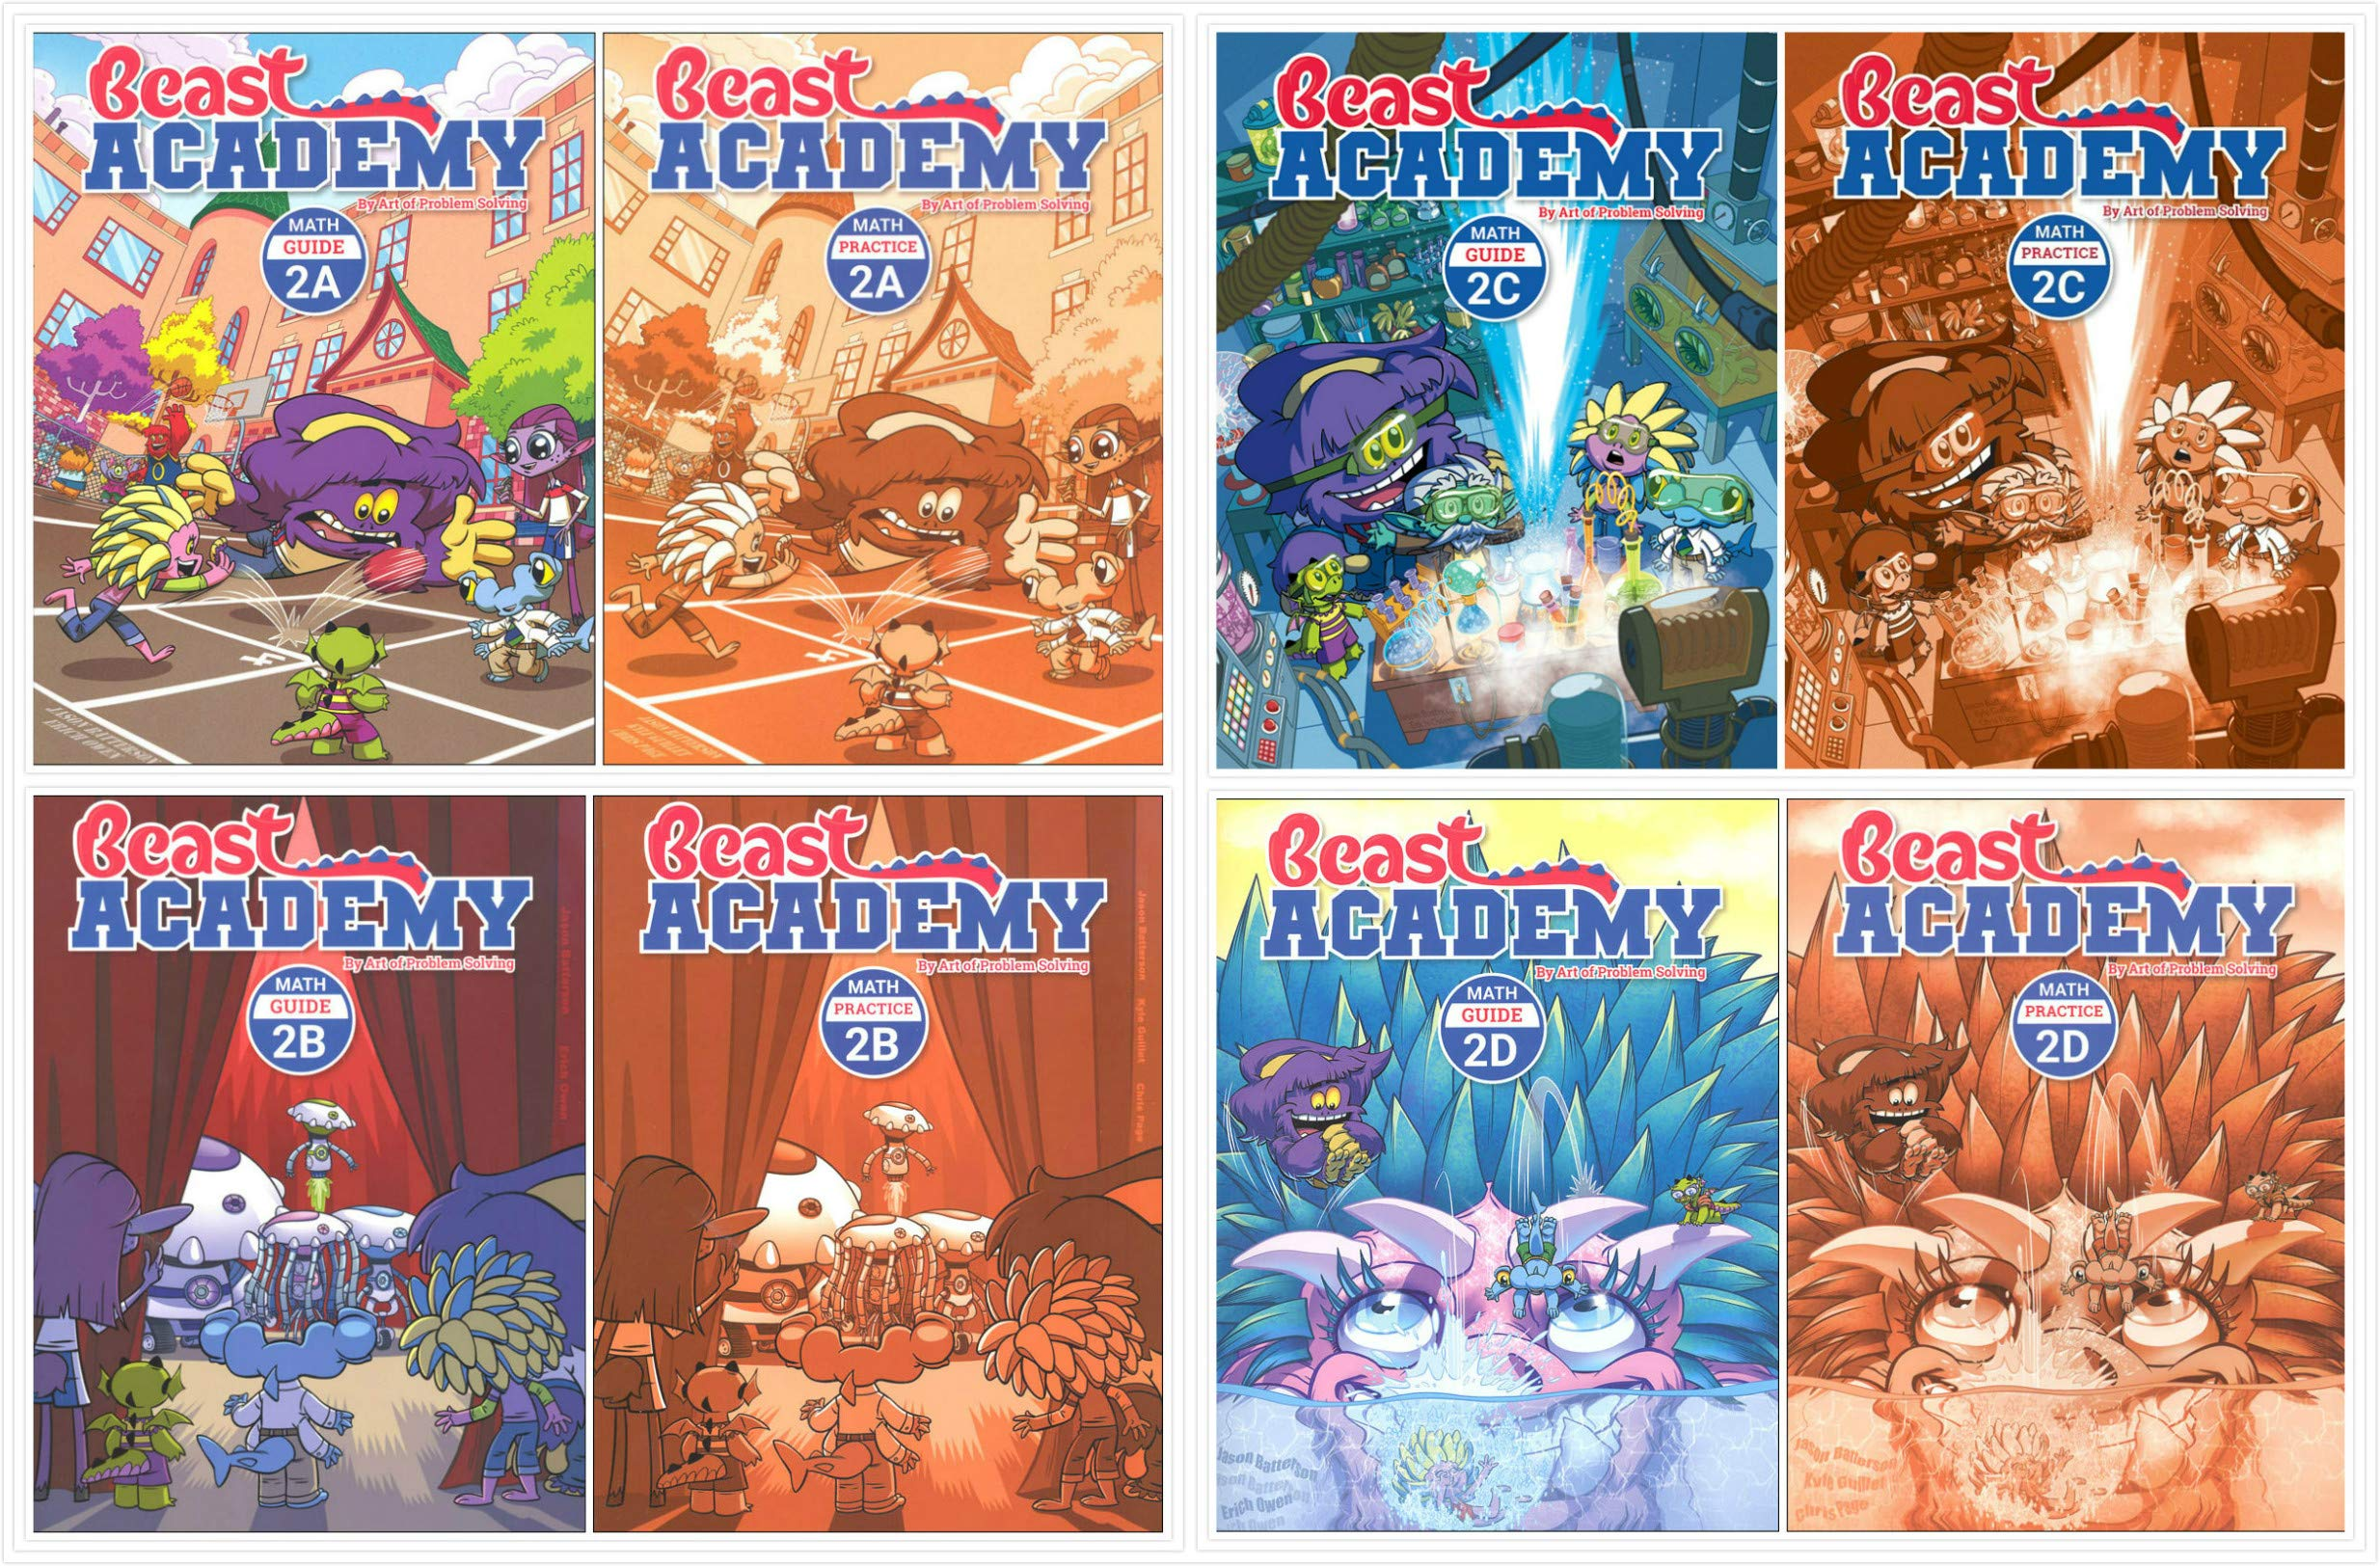 Beast Academy textbooks